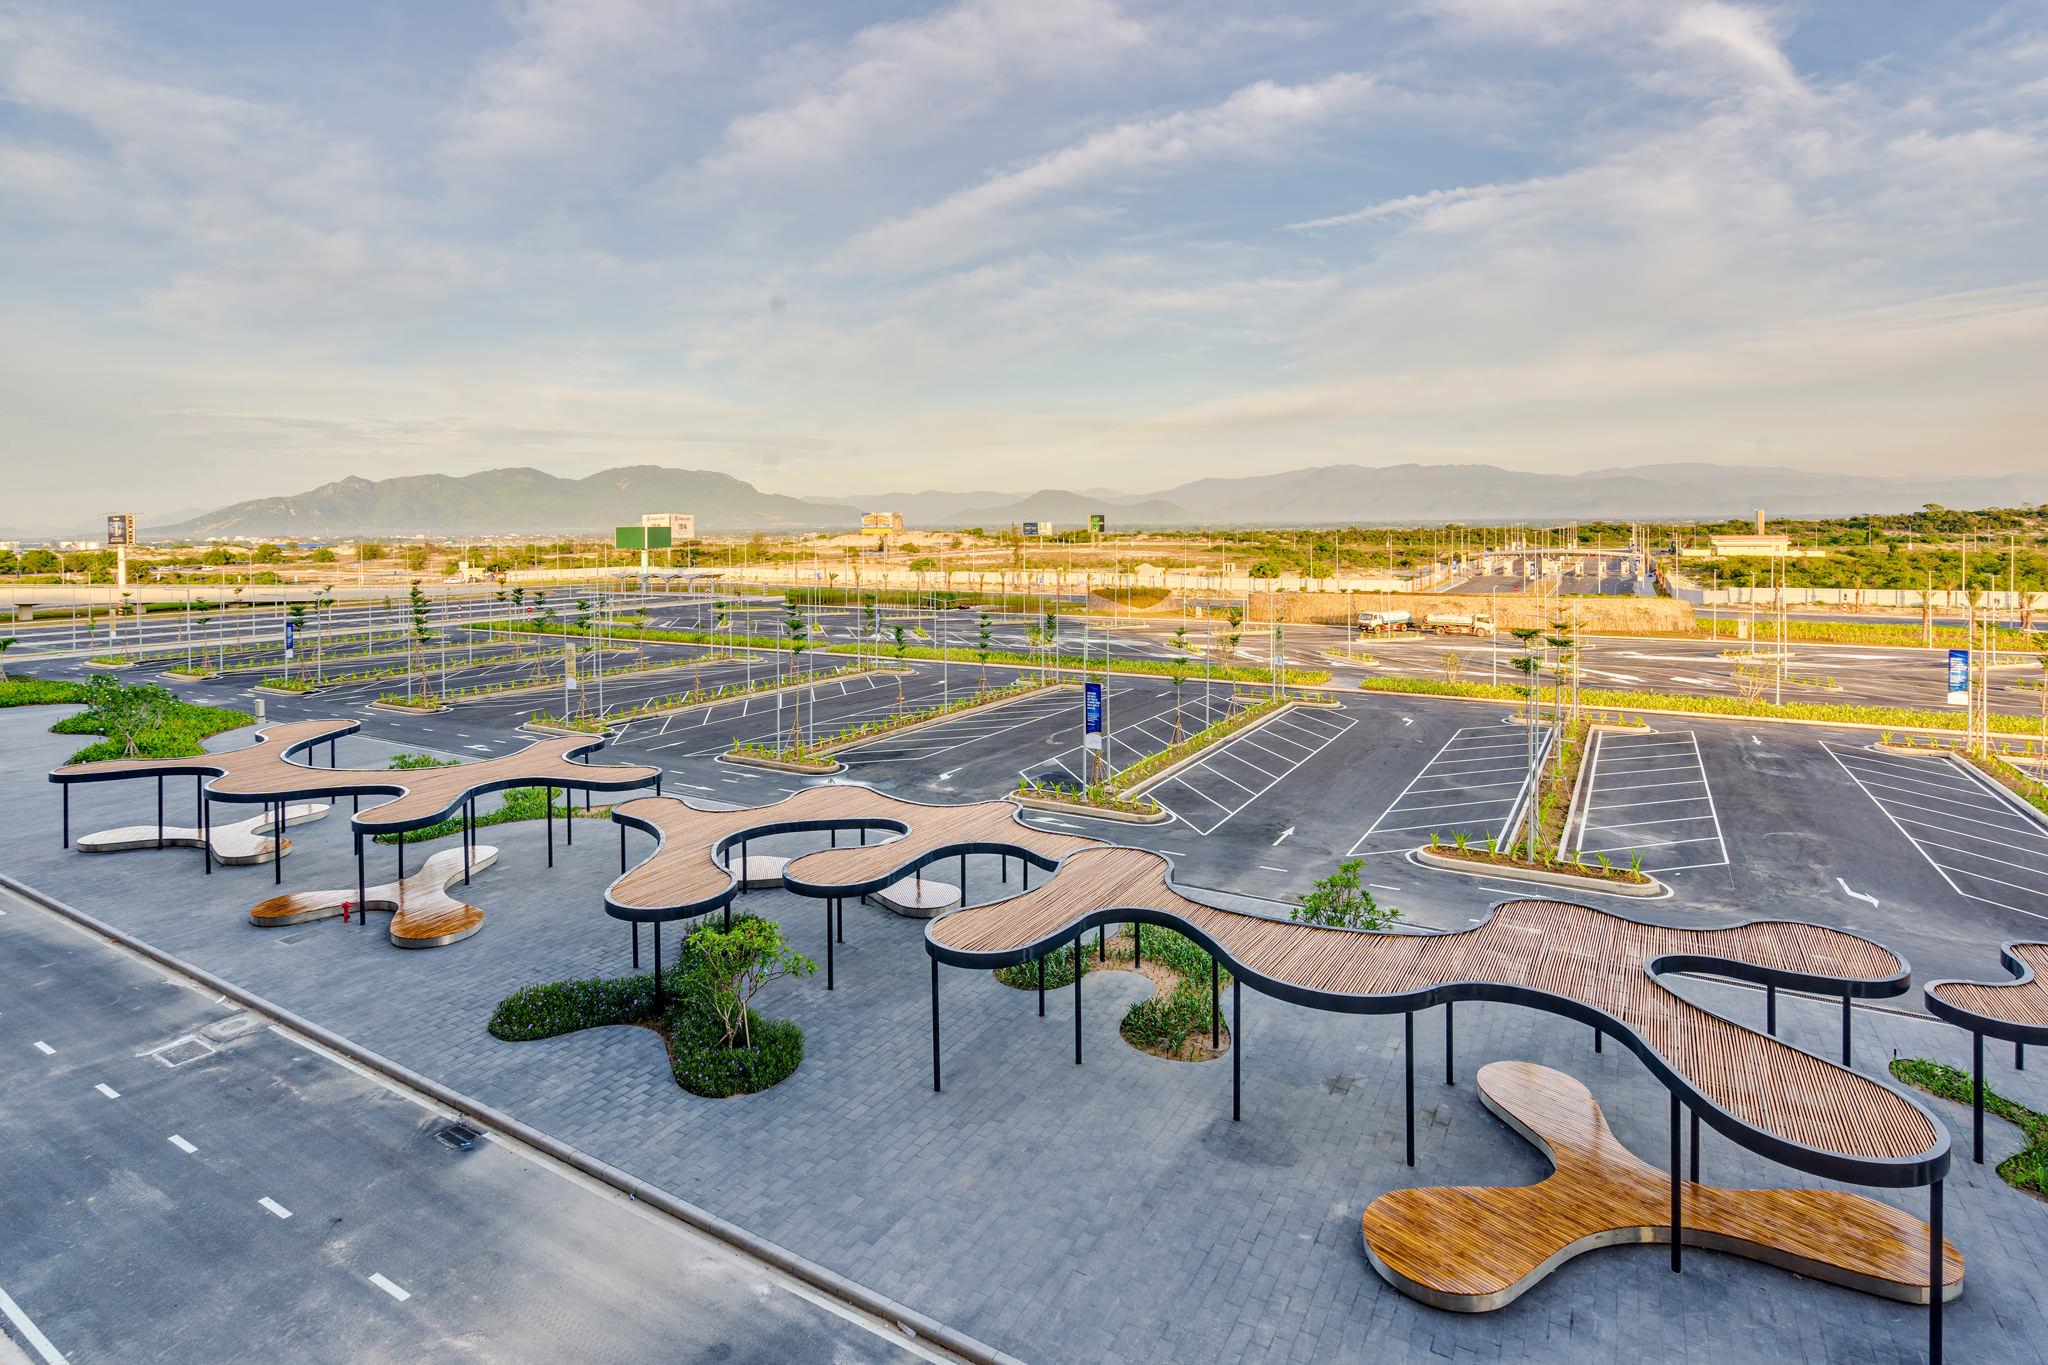 20180626 - Cam Ranh Airport - Architecture - 0058.jpg